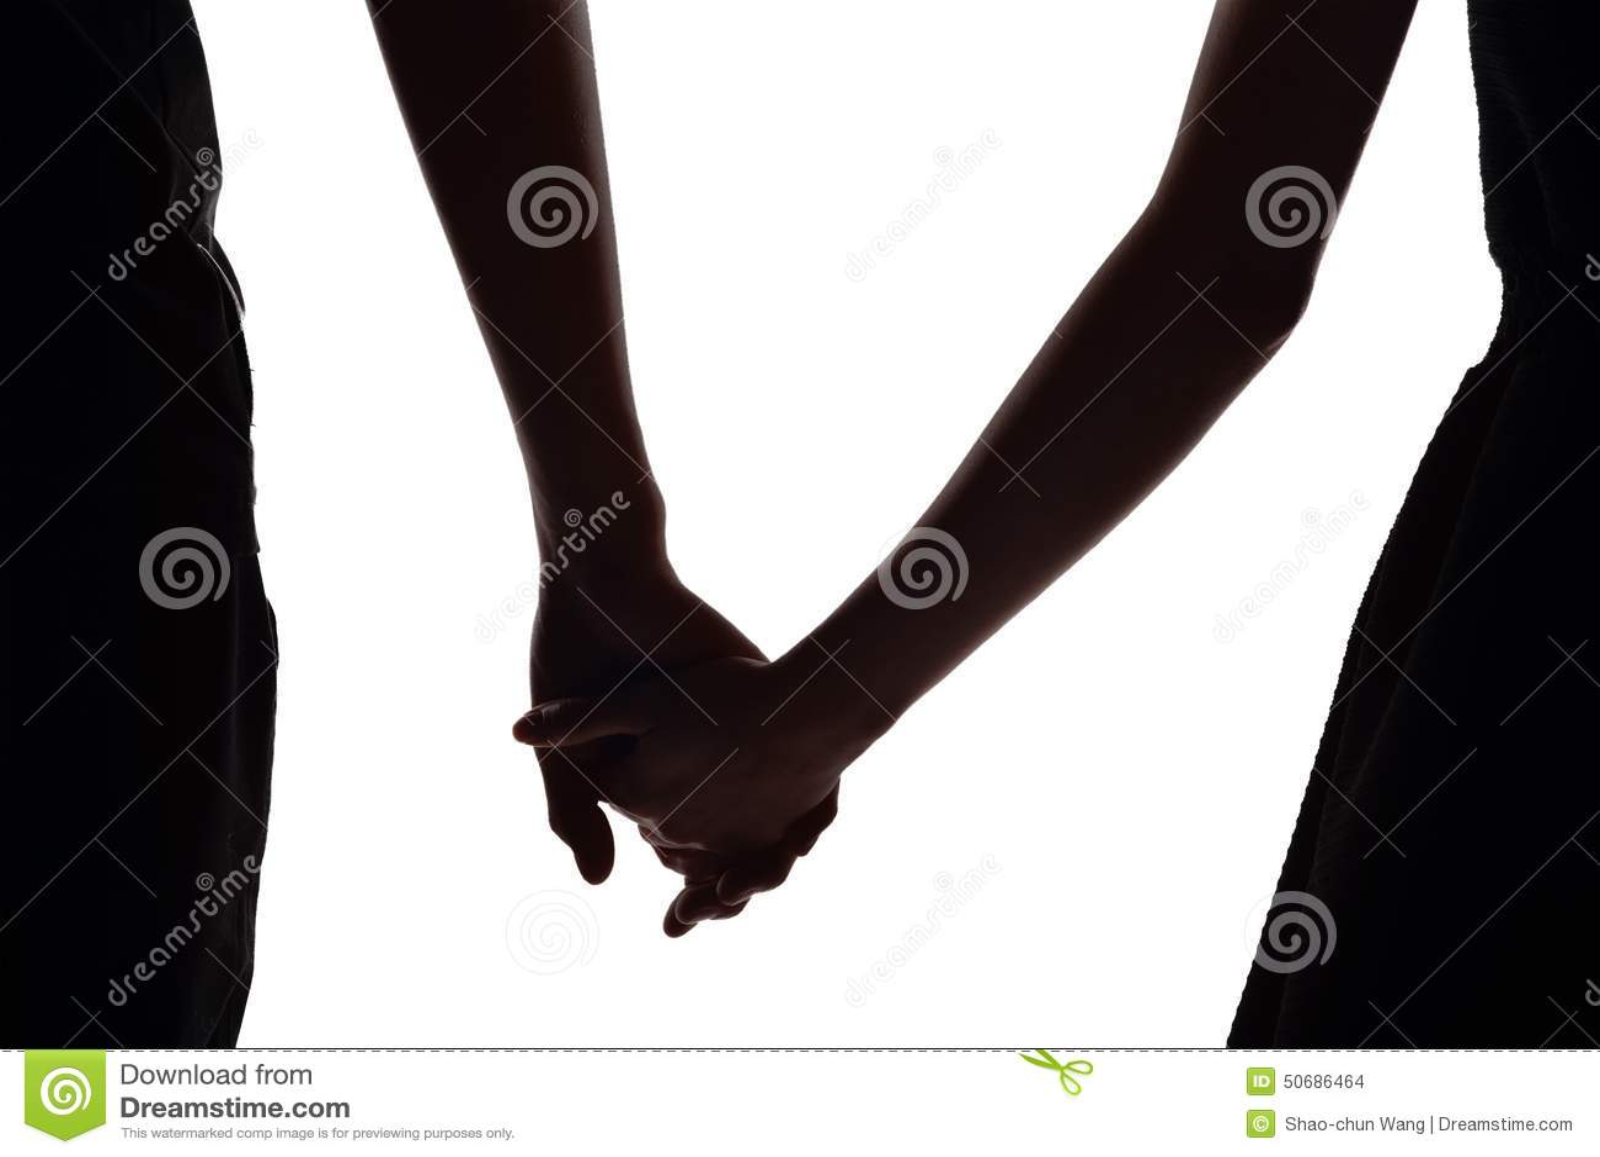 Download 爱 库存照片. 图片 包括有 幸福, 系列, 容忍, 男朋友, 暂挂, 查出, 女孩, 人力, 结婚, 人们 - 50686464